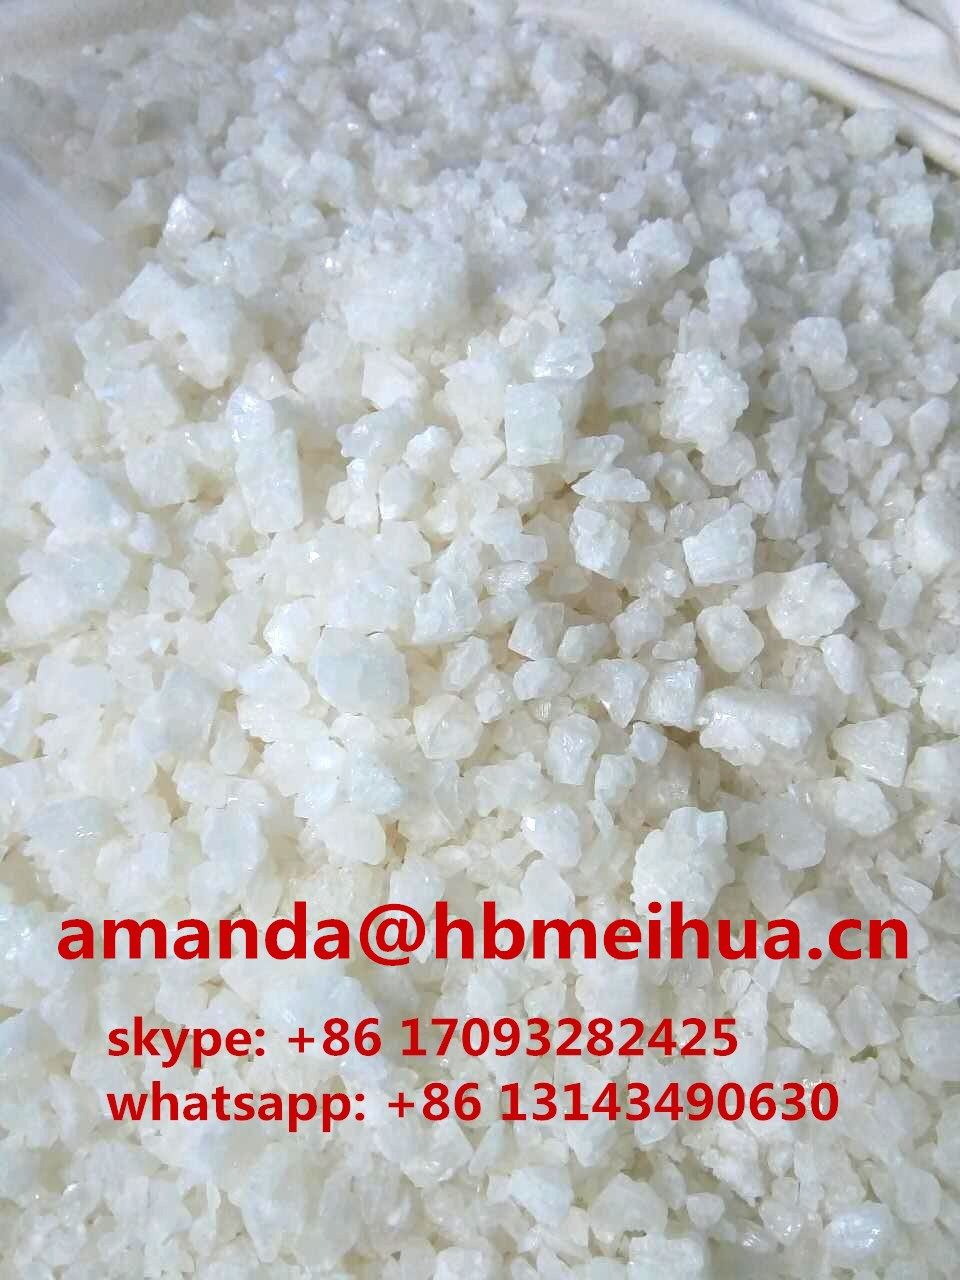 4-CEC,4-Chloroethcathinone,4mmc,4-CDC ,4cmc,amanda@hbmeihua